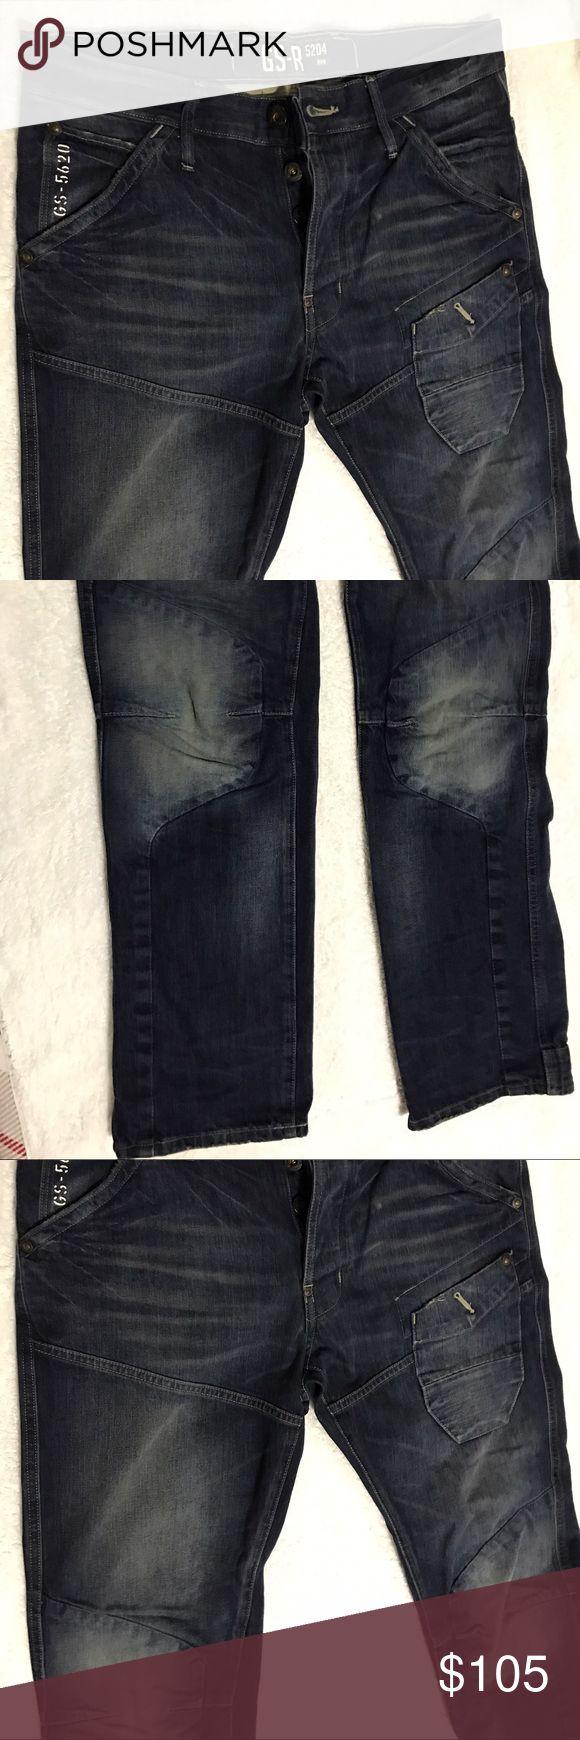 1000 ideas about dark wash jeans on pinterest rock. Black Bedroom Furniture Sets. Home Design Ideas